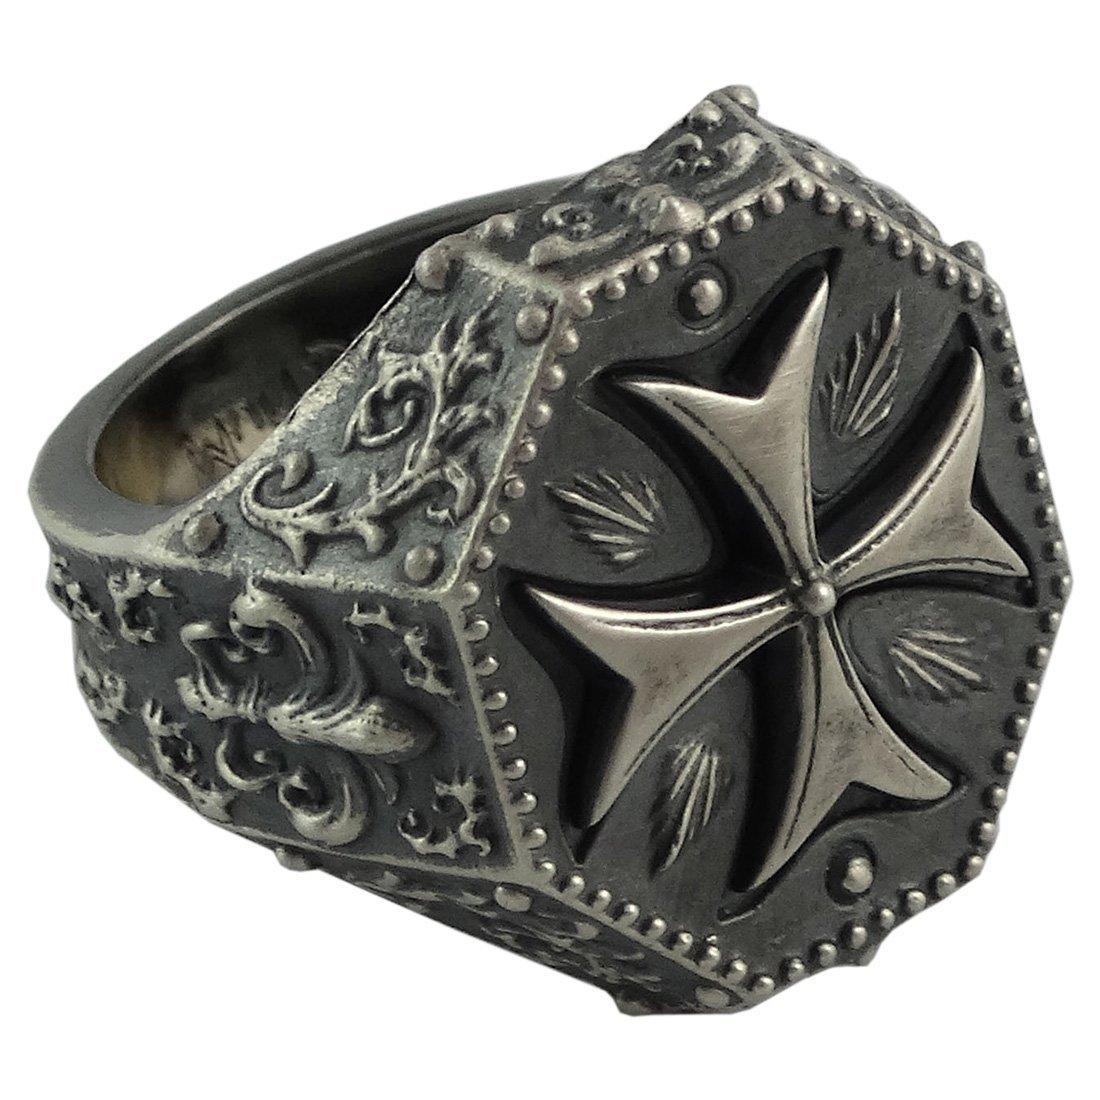 Silver Maltese Cross Knight Templar Mens Ring Fleur De Lis Masonic Jewelry